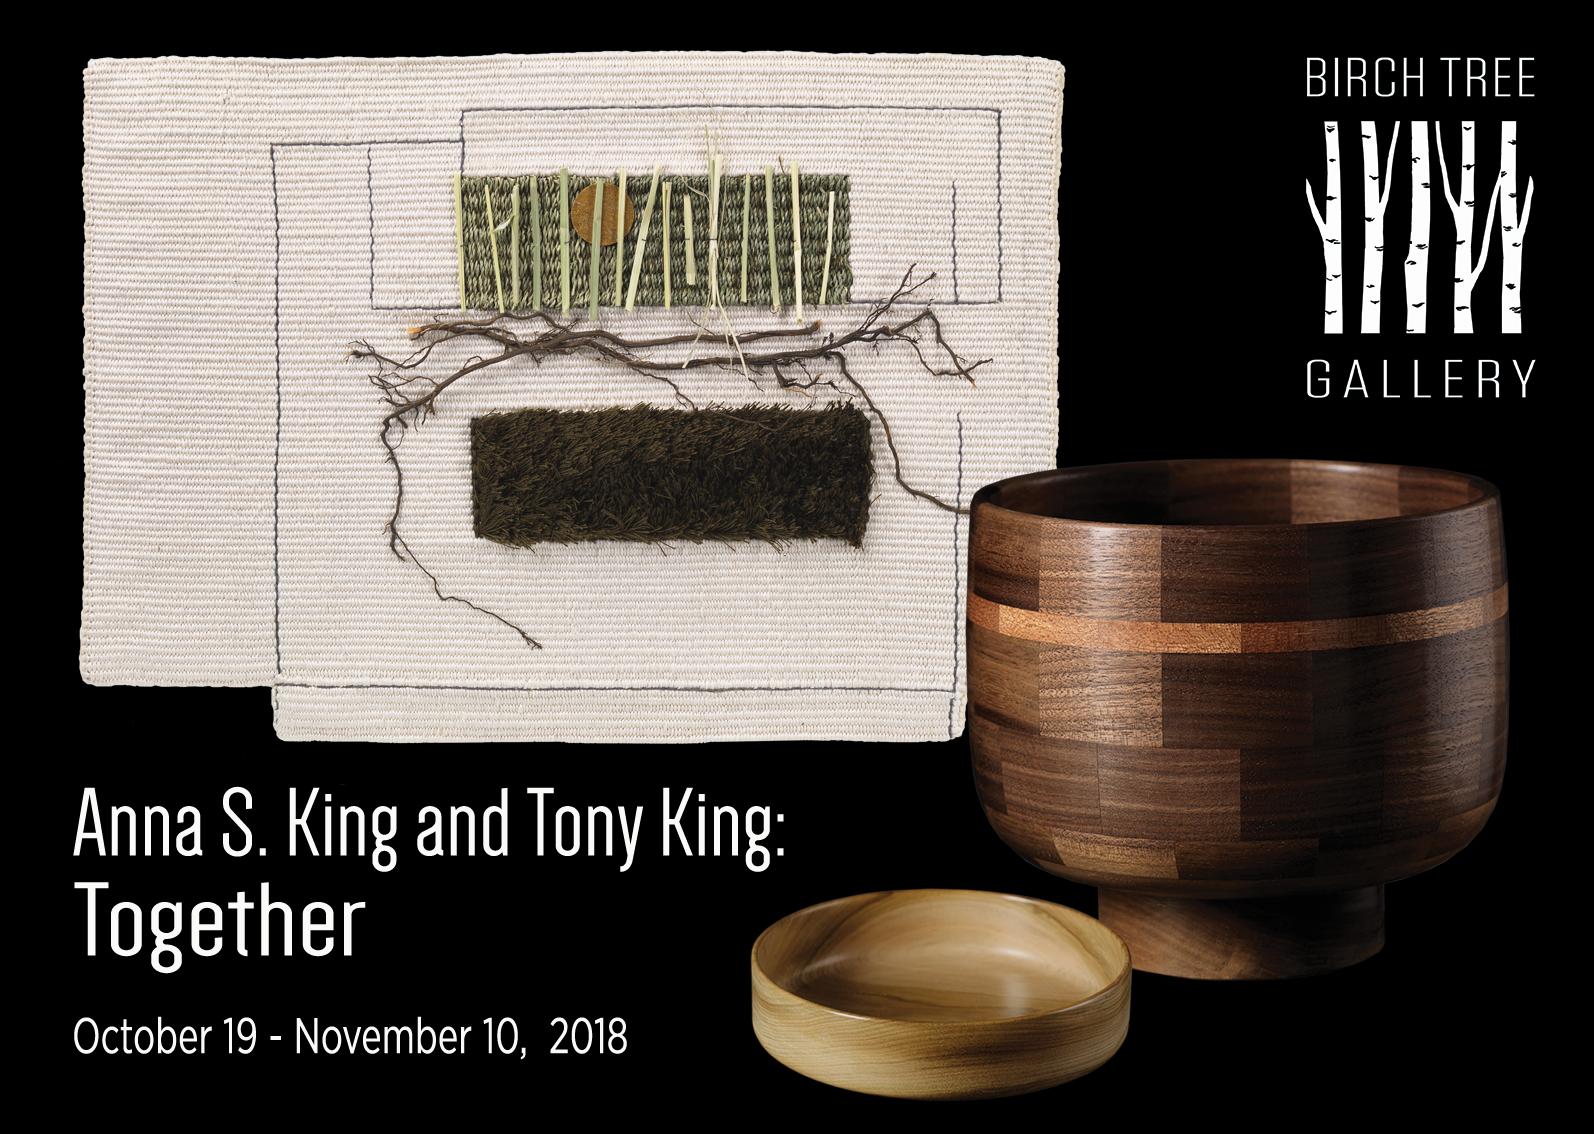 Birch Tree Gallery. Exhibition 'Together'